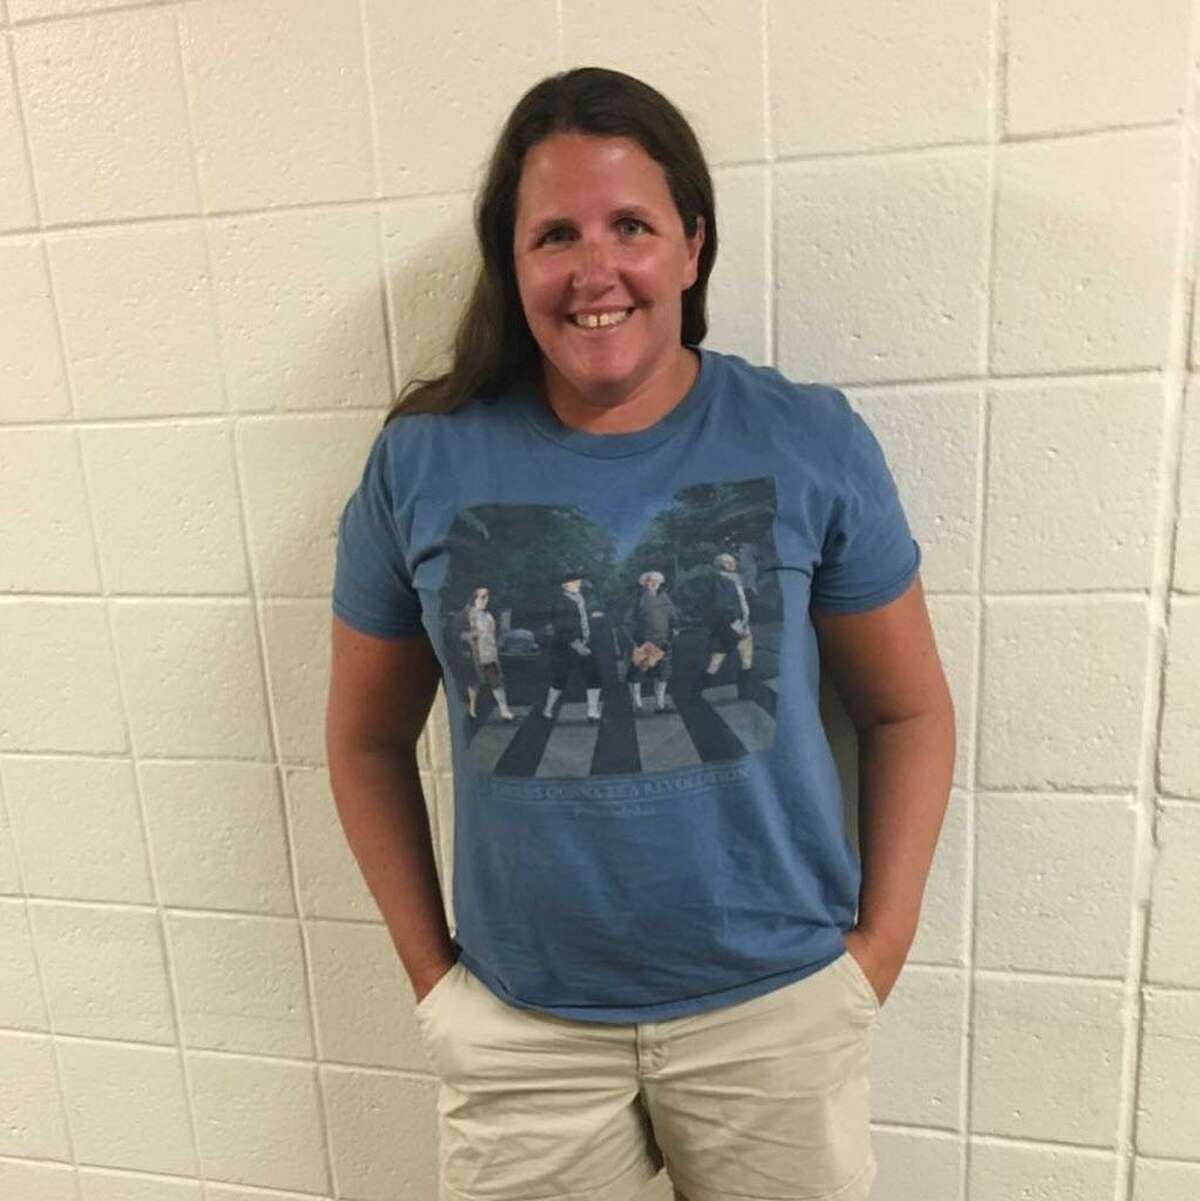 Trumbull High School history teacher Katie Boland